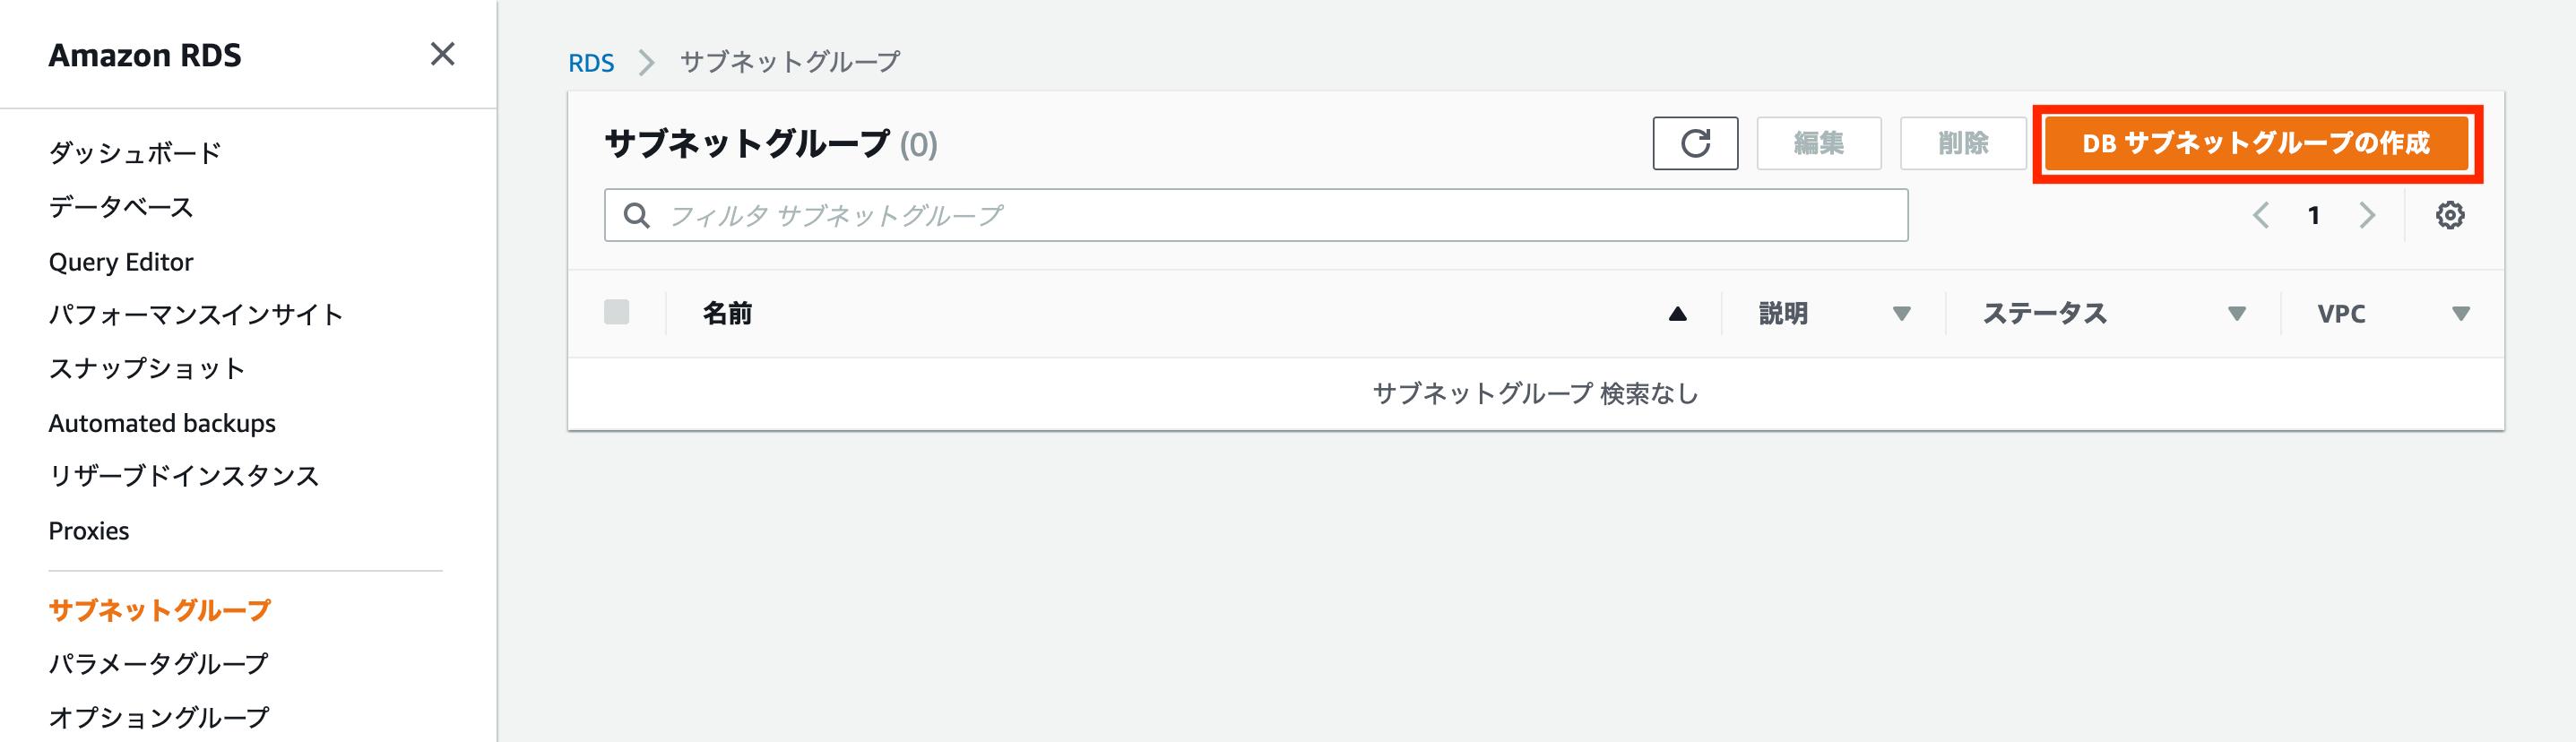 DBサブネットグループ作成①.png